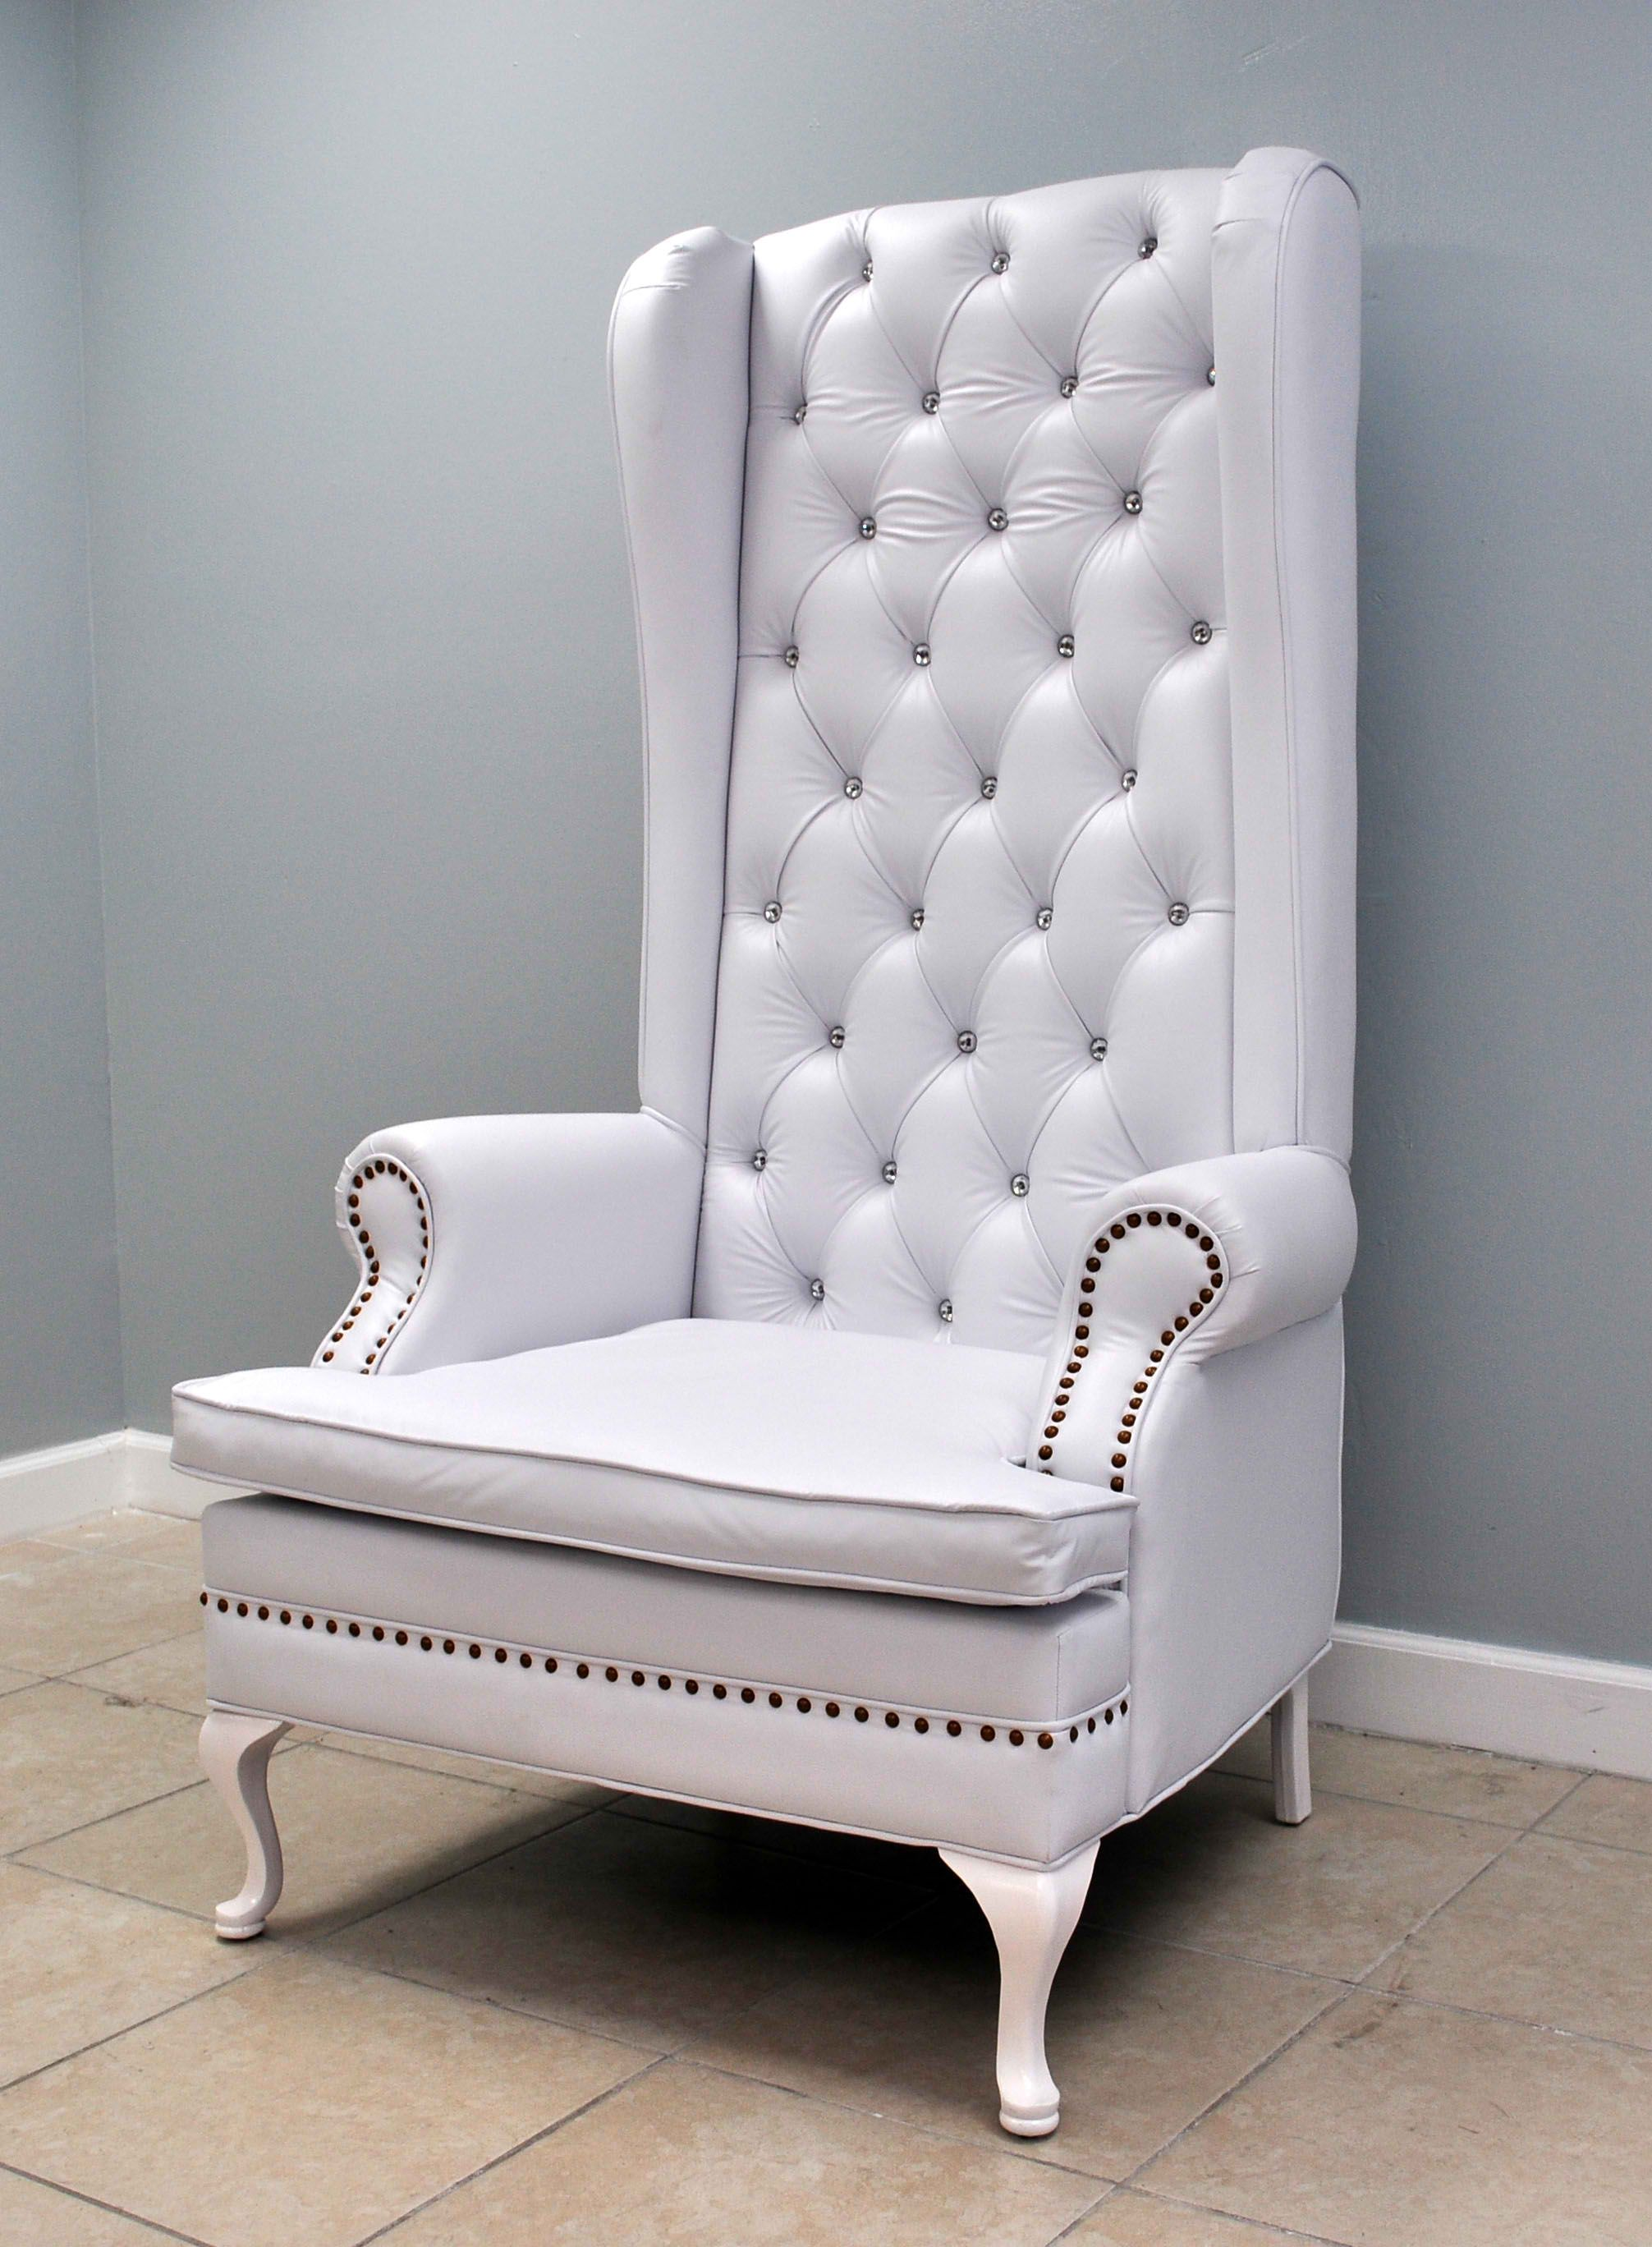 white throne chair baby shower it 39 s a boy pinterest